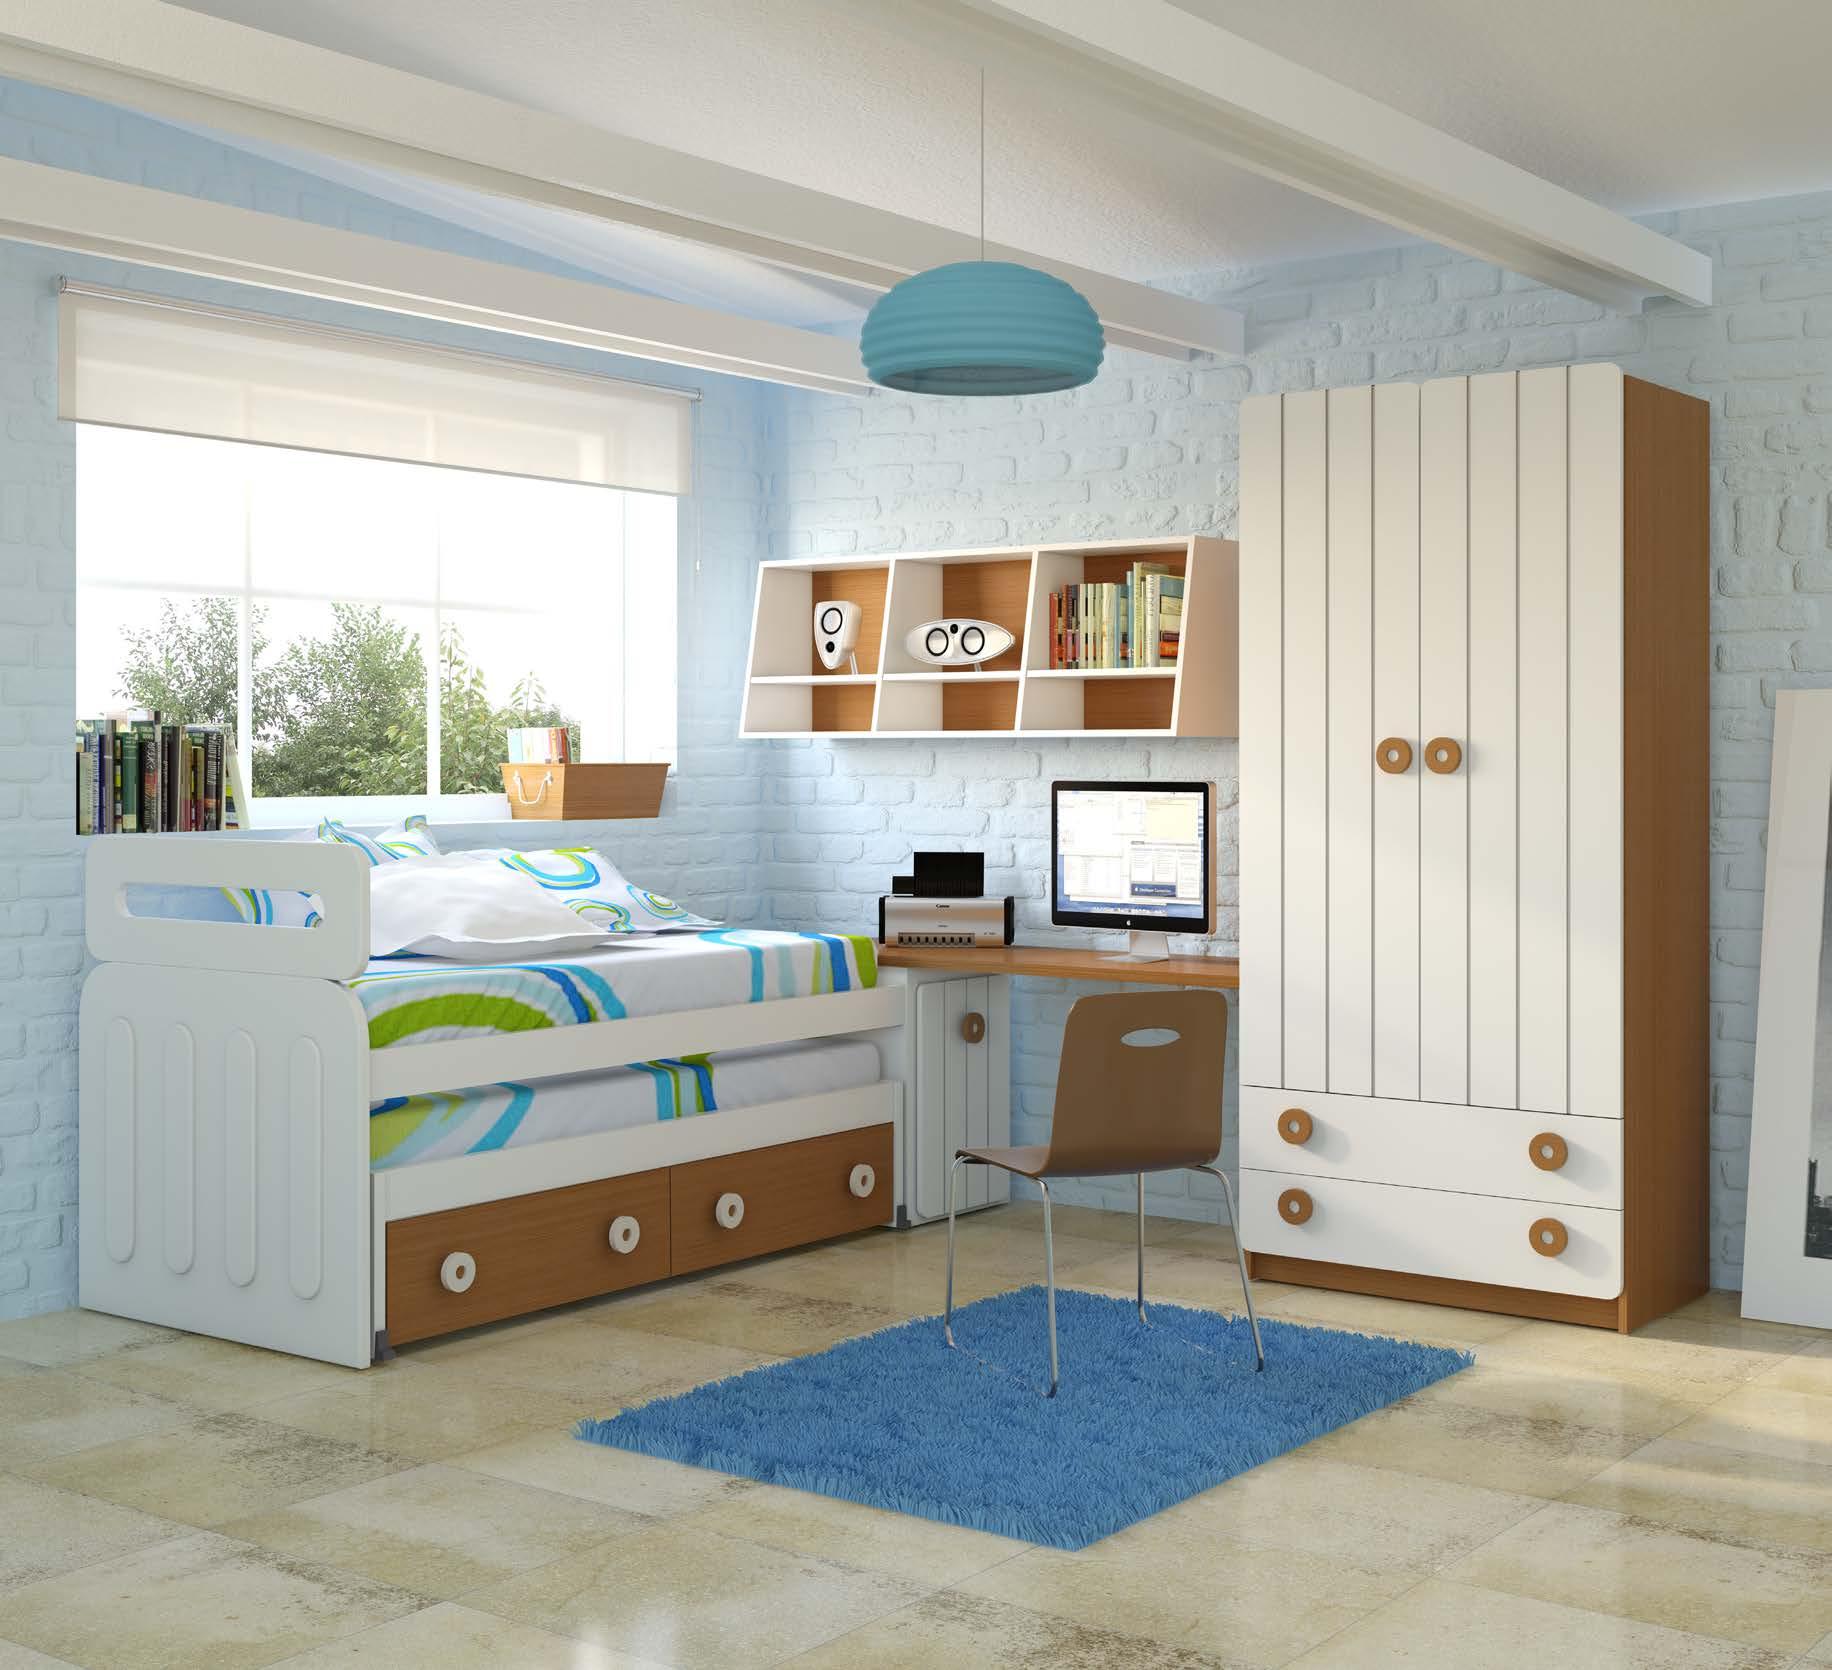 compactos-Happy-muebles-paco-caballero-509-5c95270faf5e6